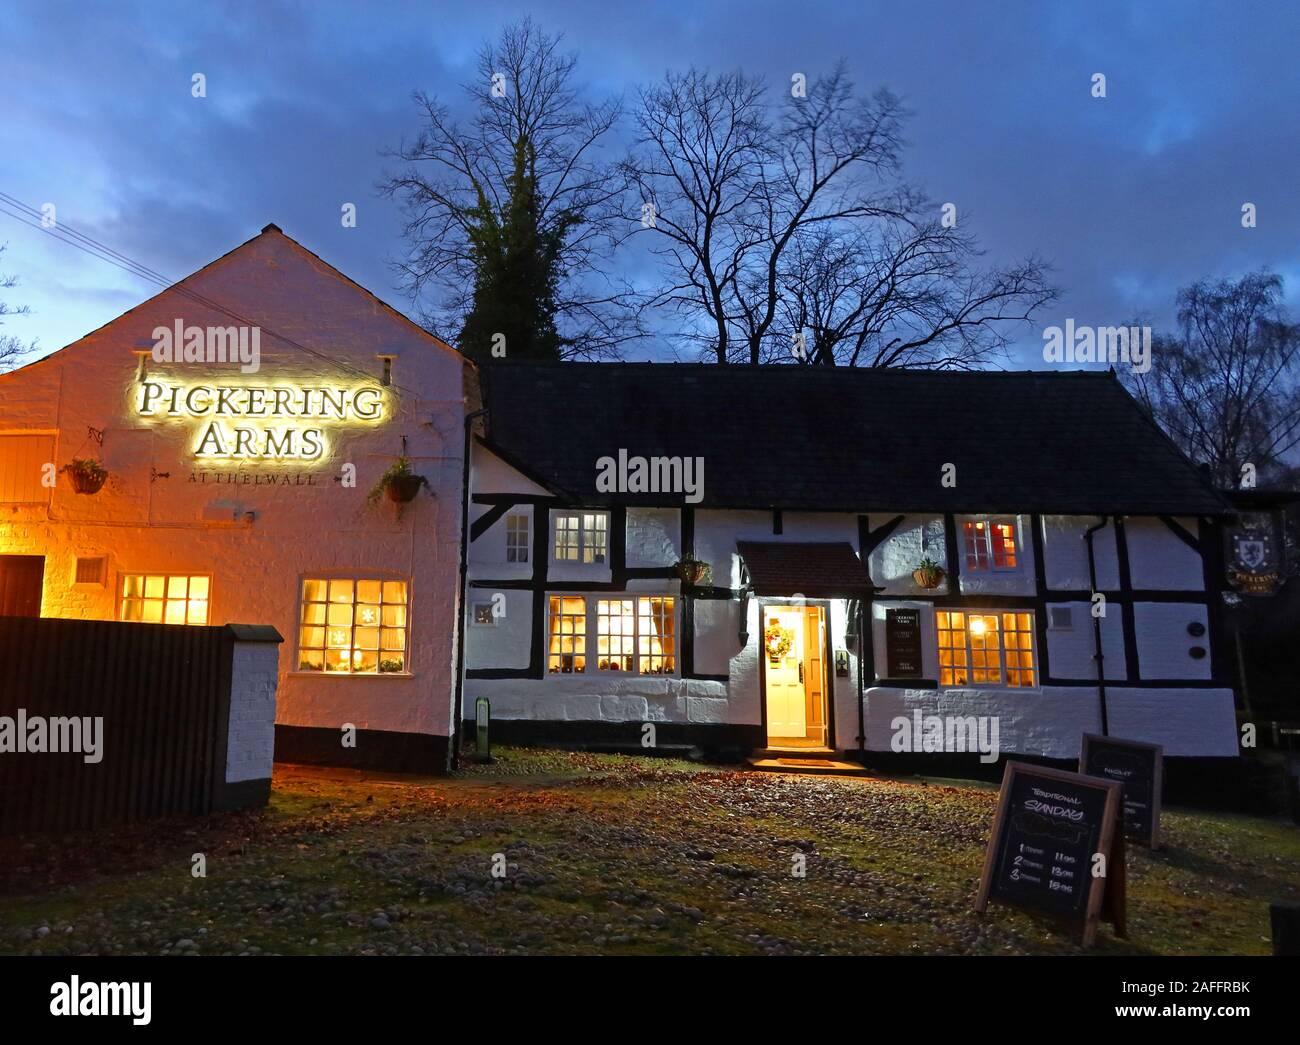 @HotpixUk,HotpixUK,GoTonySmith,pub,bar,at dusk,night,night time,Cheshire,England,UK,winter,warm,16th century,16th,century,history,historic,tavern,taverns,inn,inns,Inglenook Inns & Taverns,Ingle nook